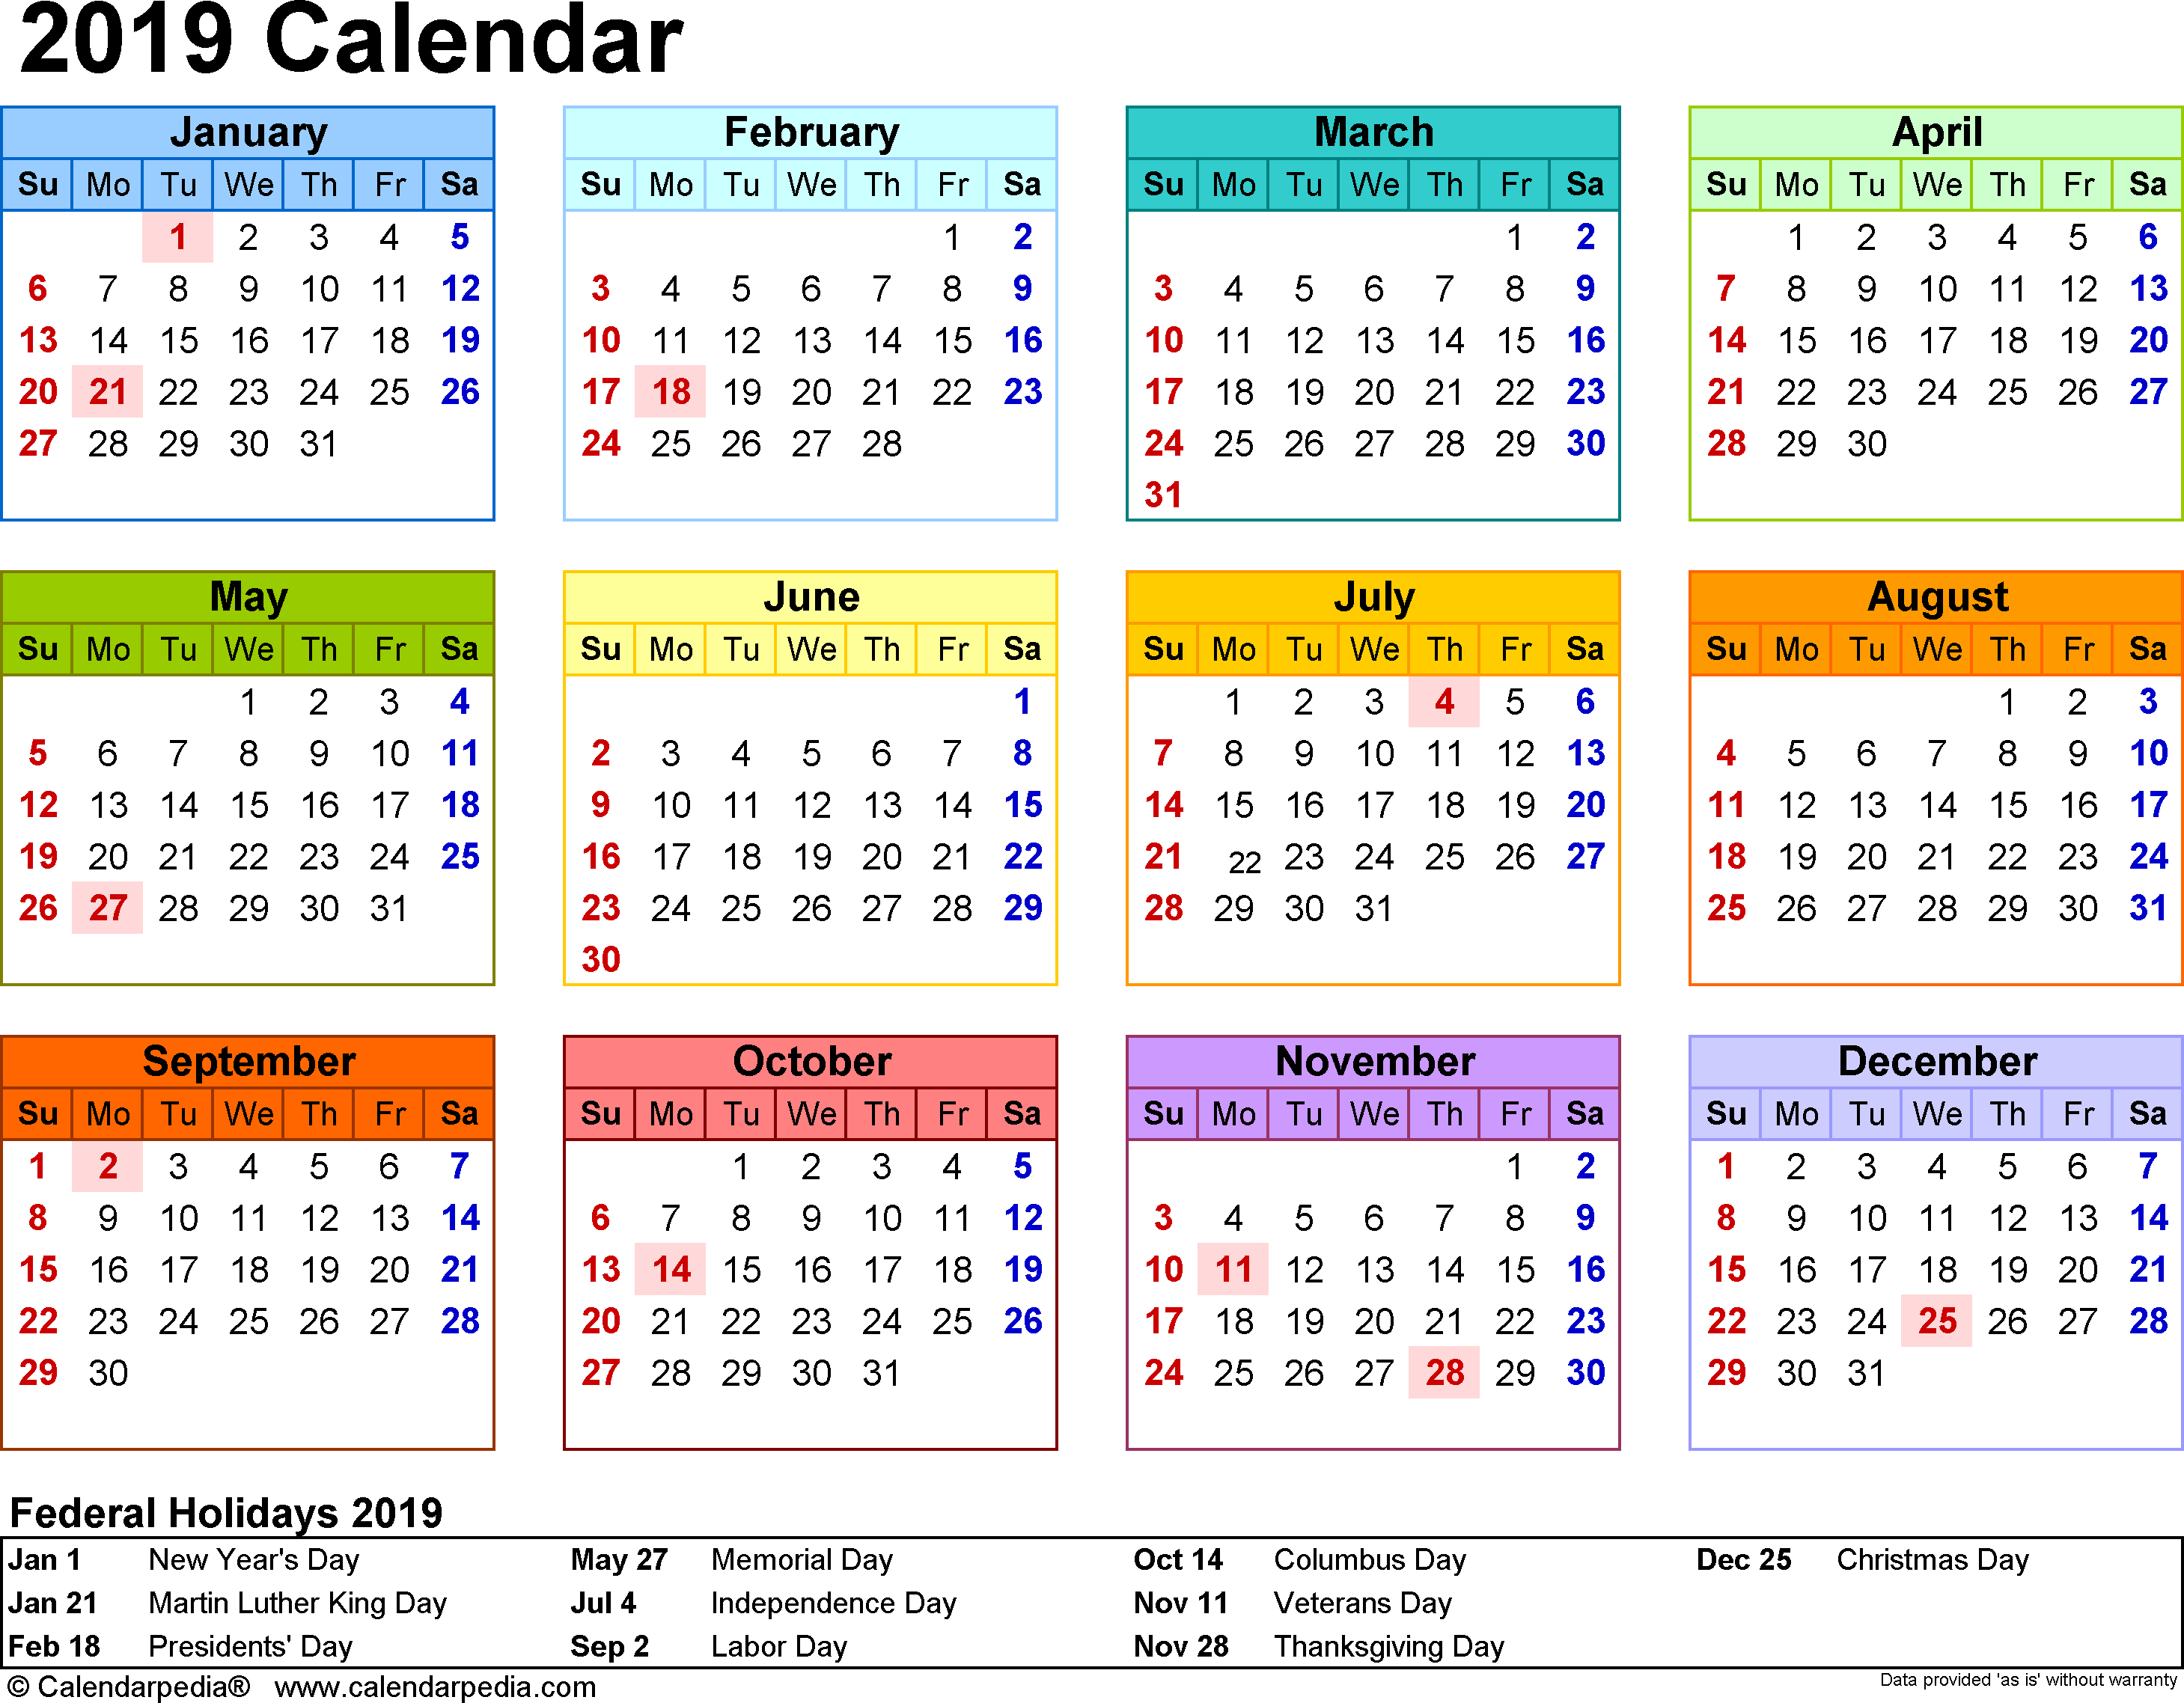 Printable 2019 Calendar Nsw | Printable Calendar 2019 within Calendar October 2019 Nsw Printable